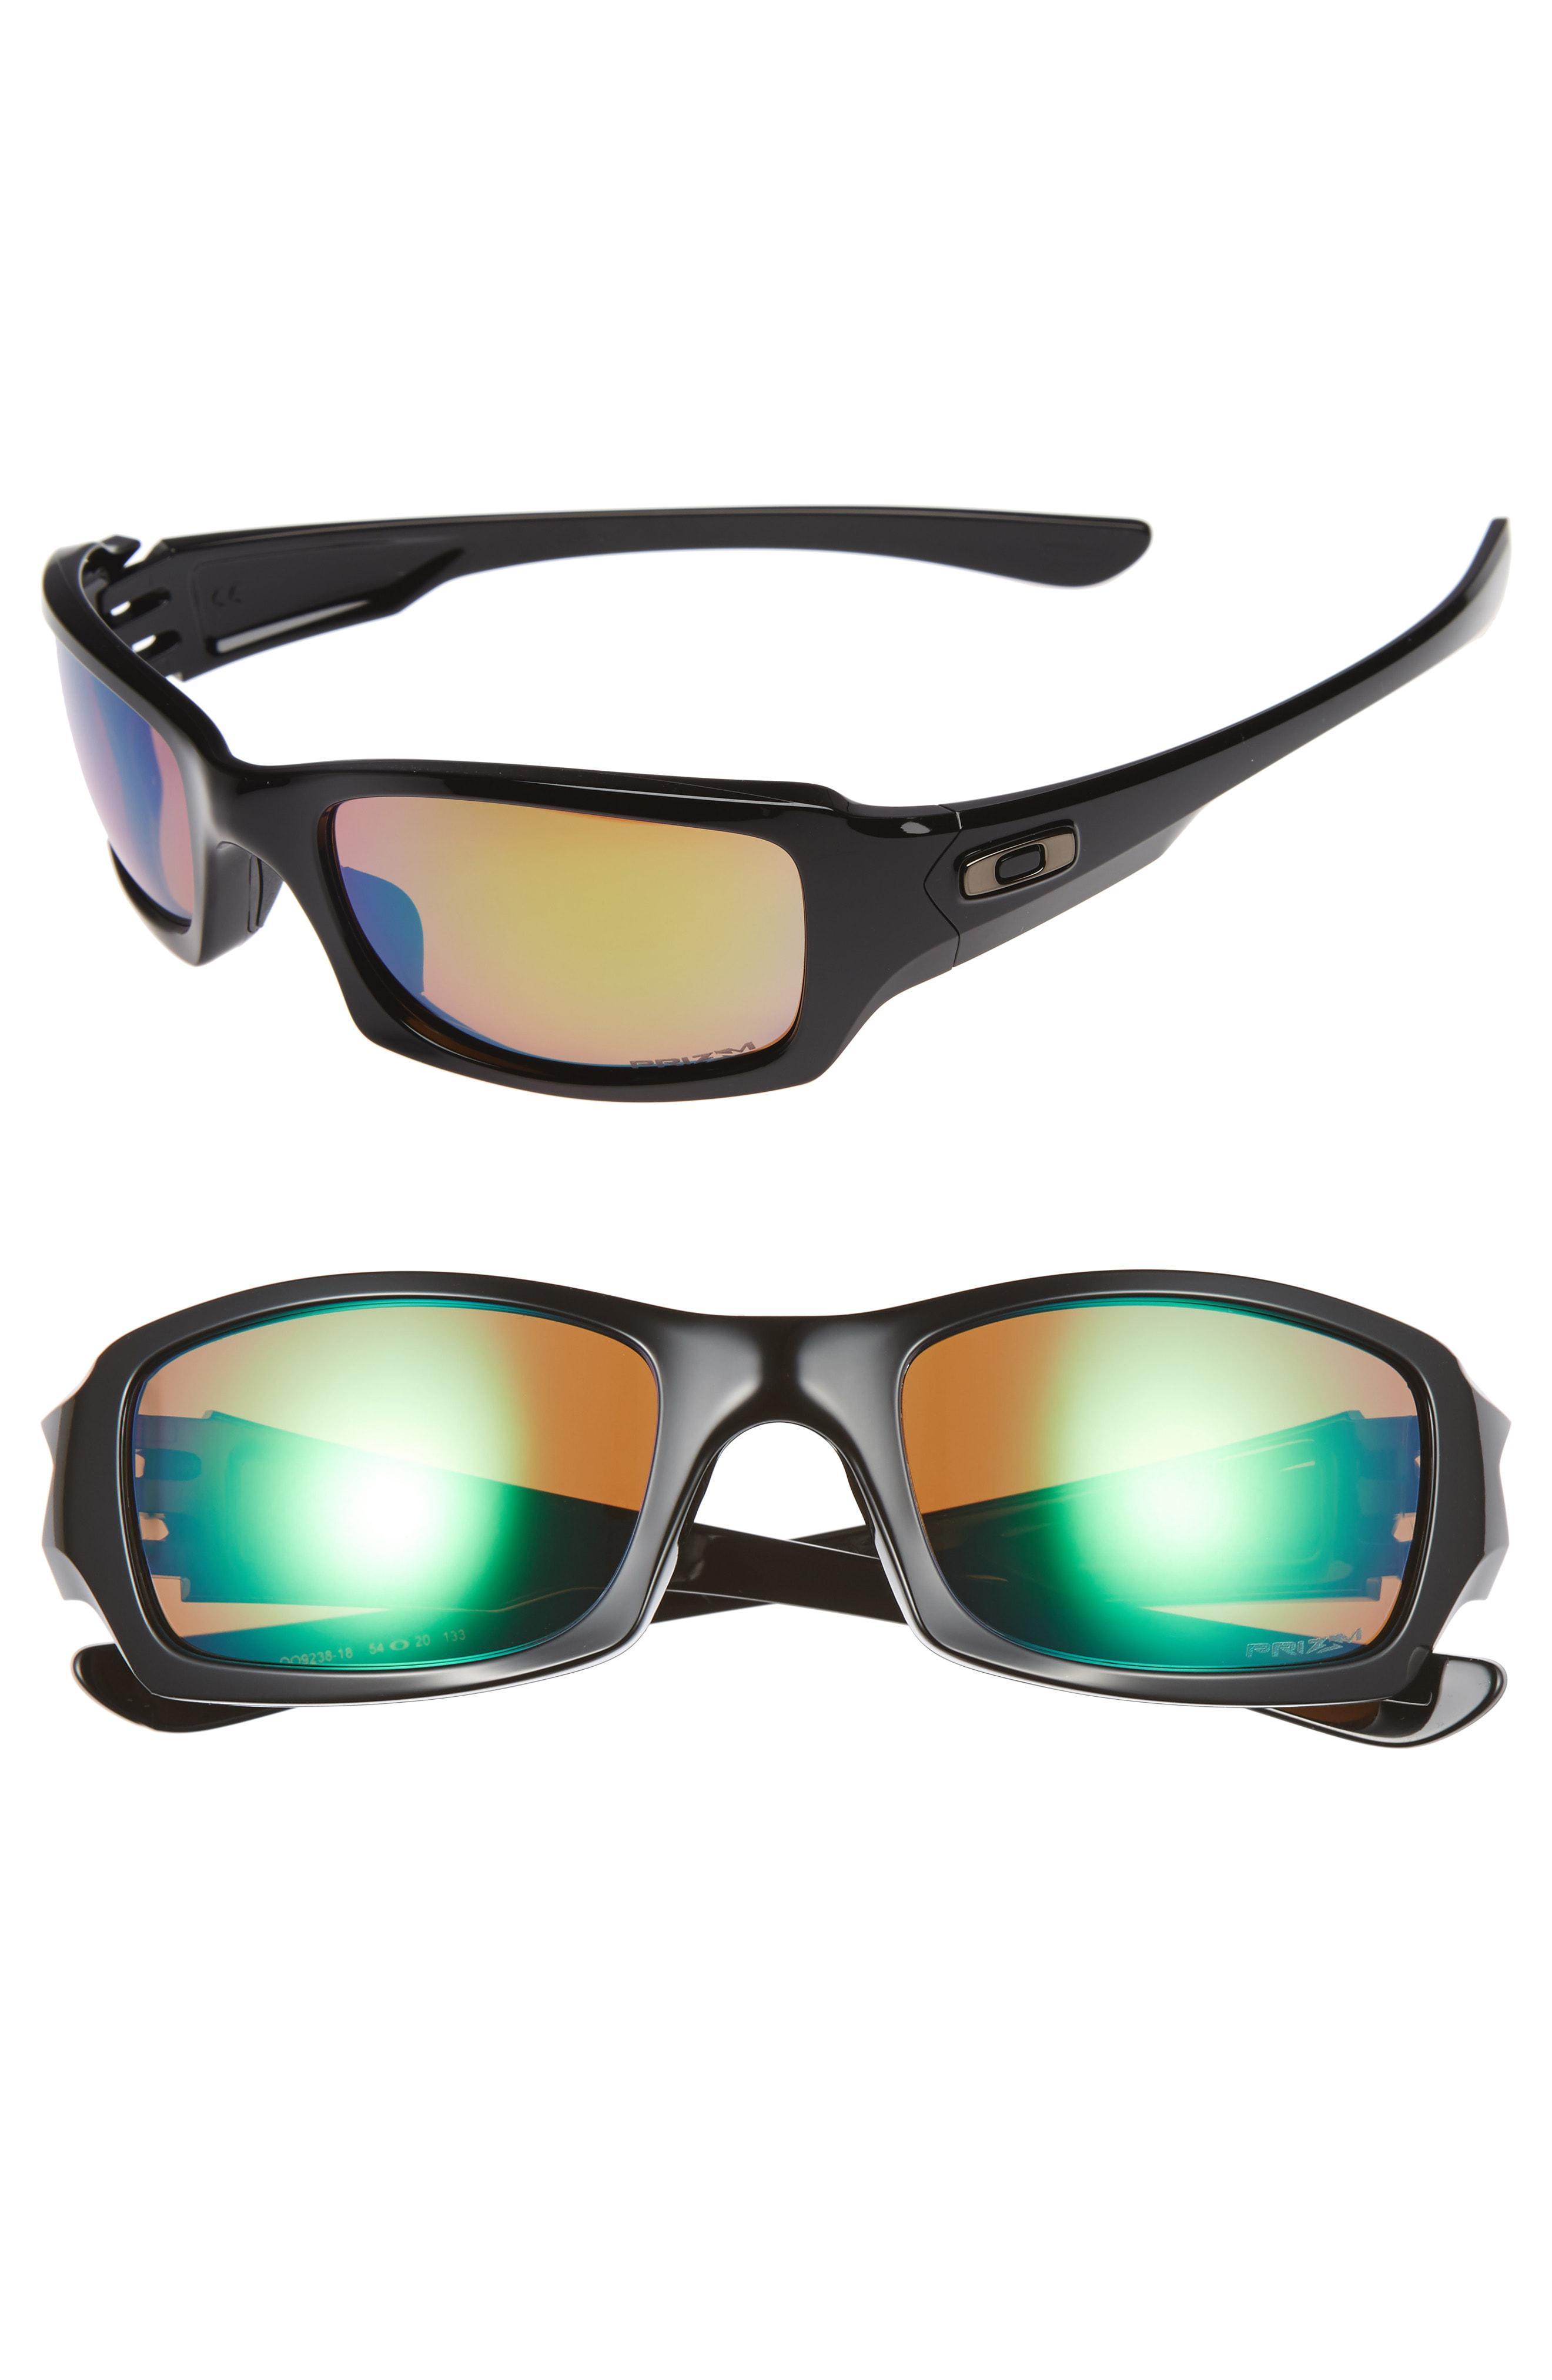 e3c594bb56 Lyst - Oakley Fives Squared H2o 54mm Polarized Sunglasses in Black ...